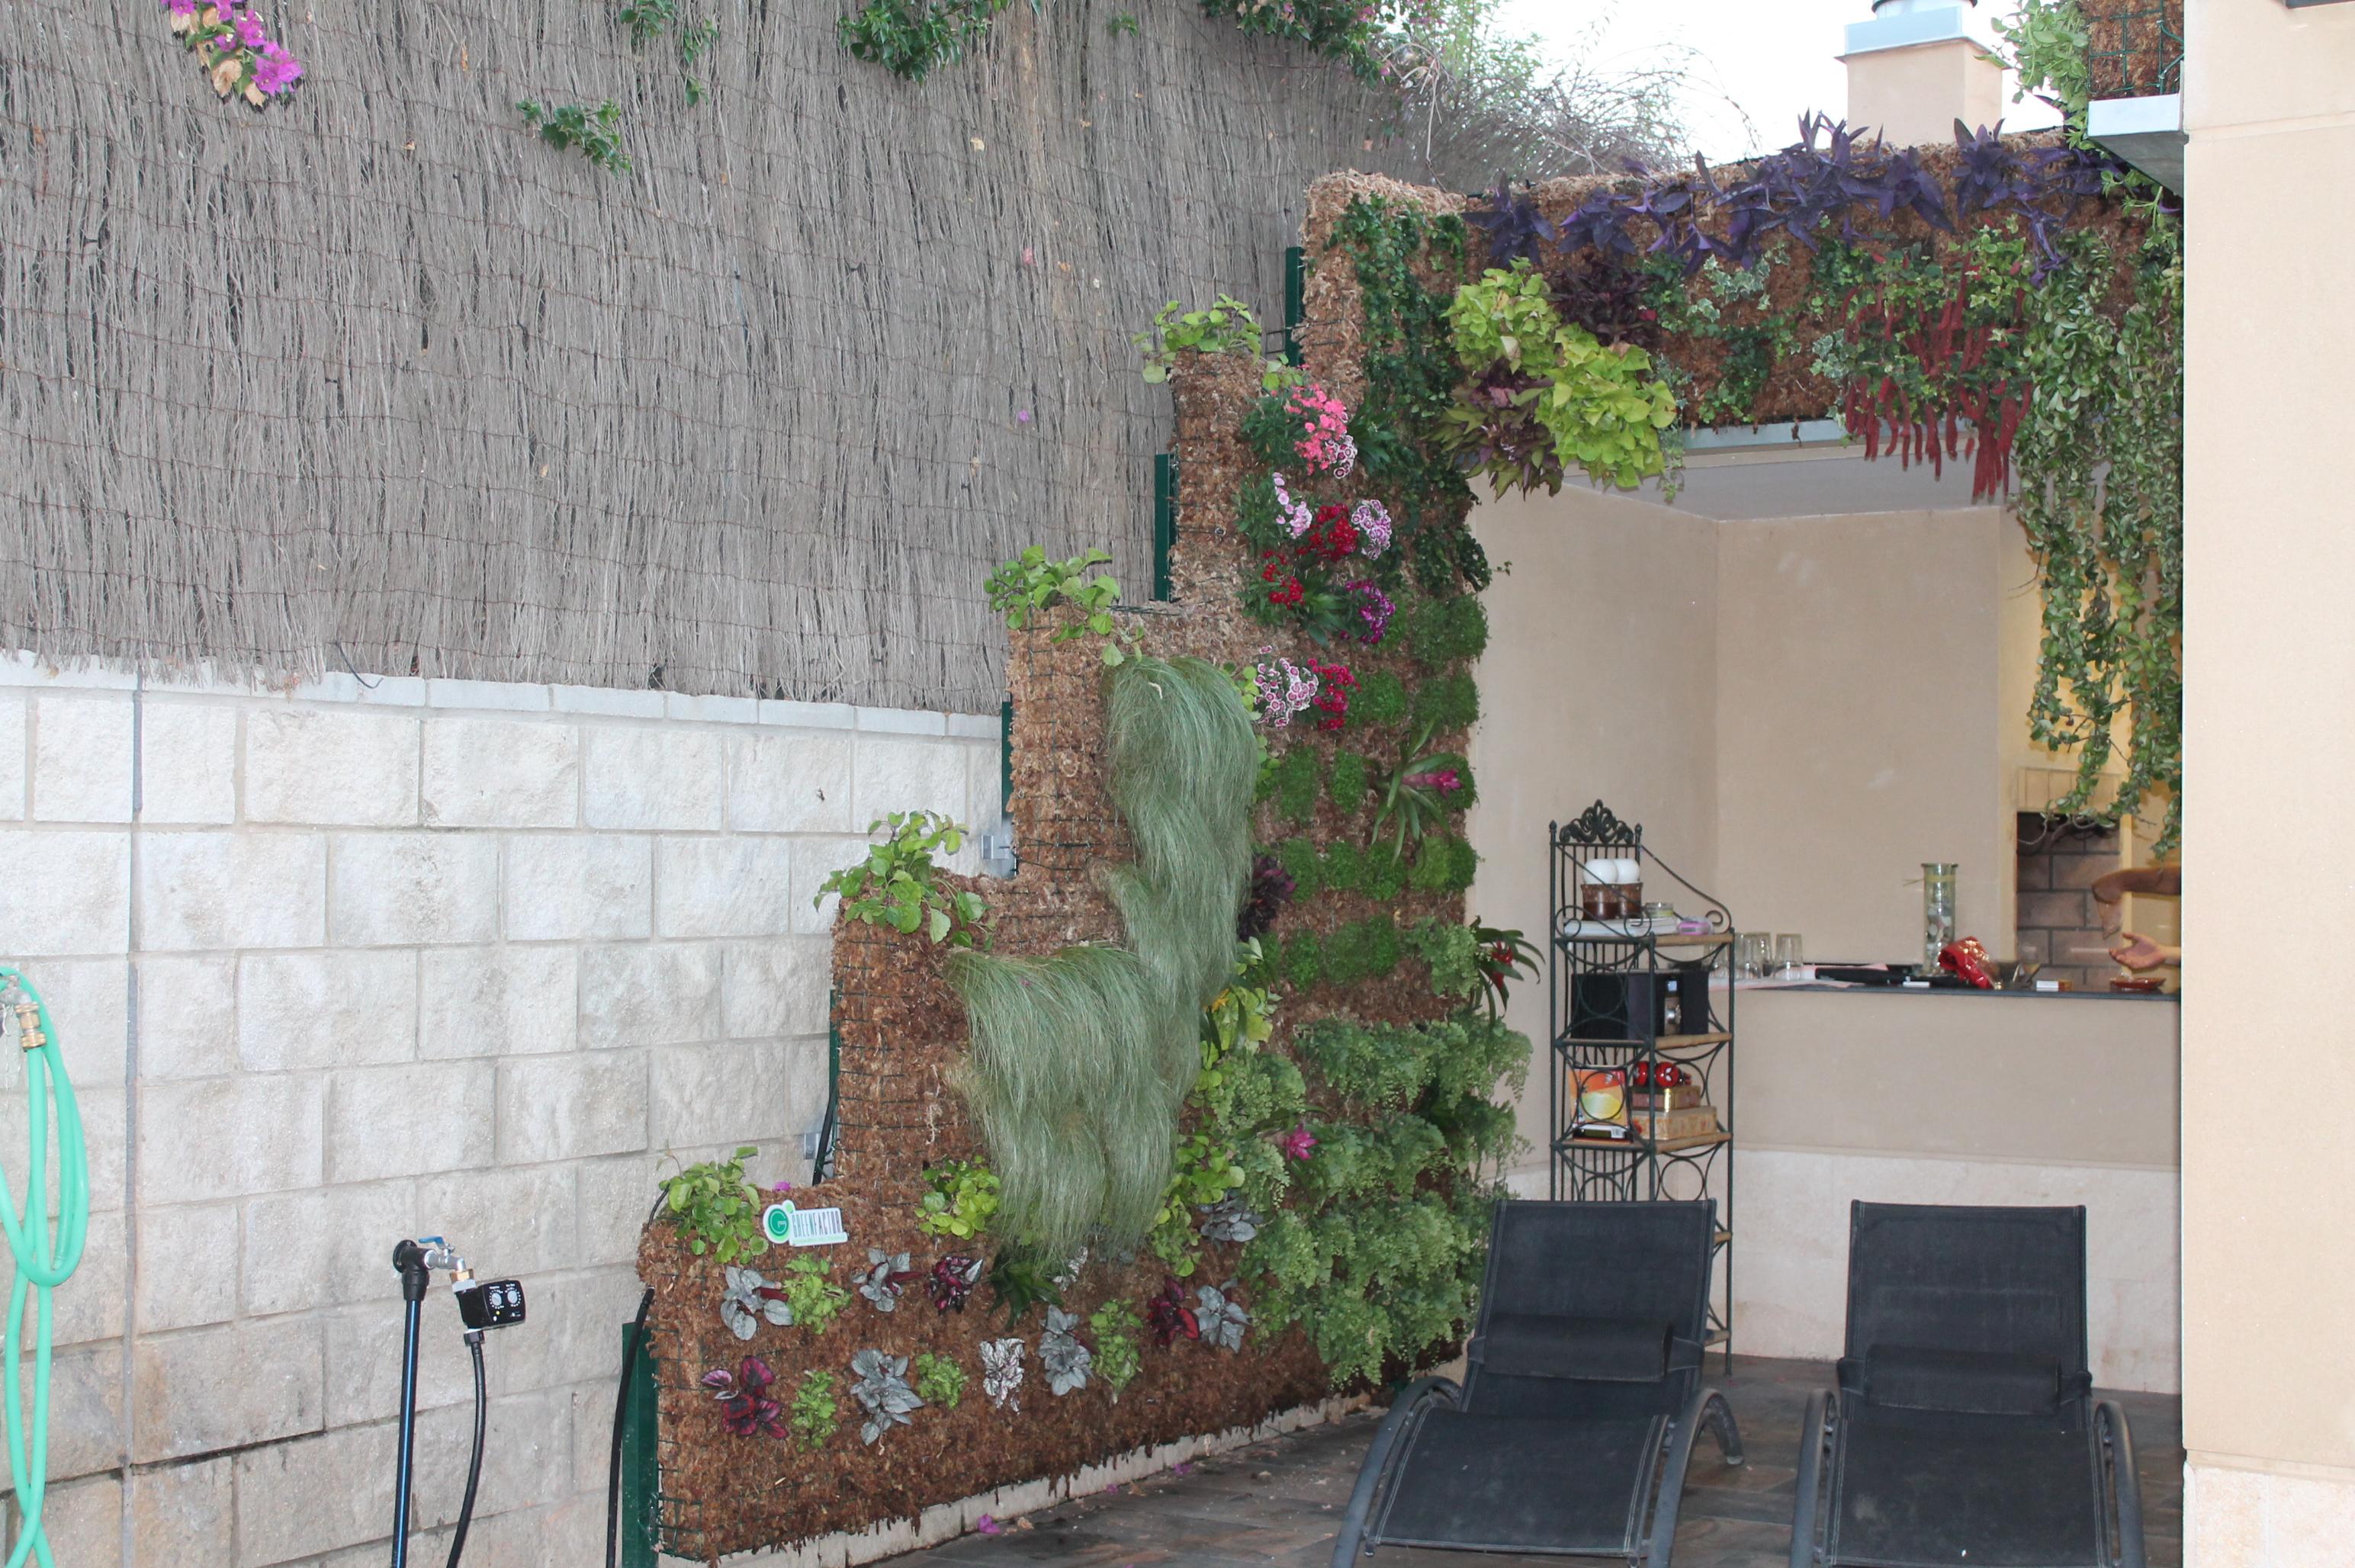 Otro ejemplo de jard n vertical jardineria sevilla for Jardin vertical sevilla